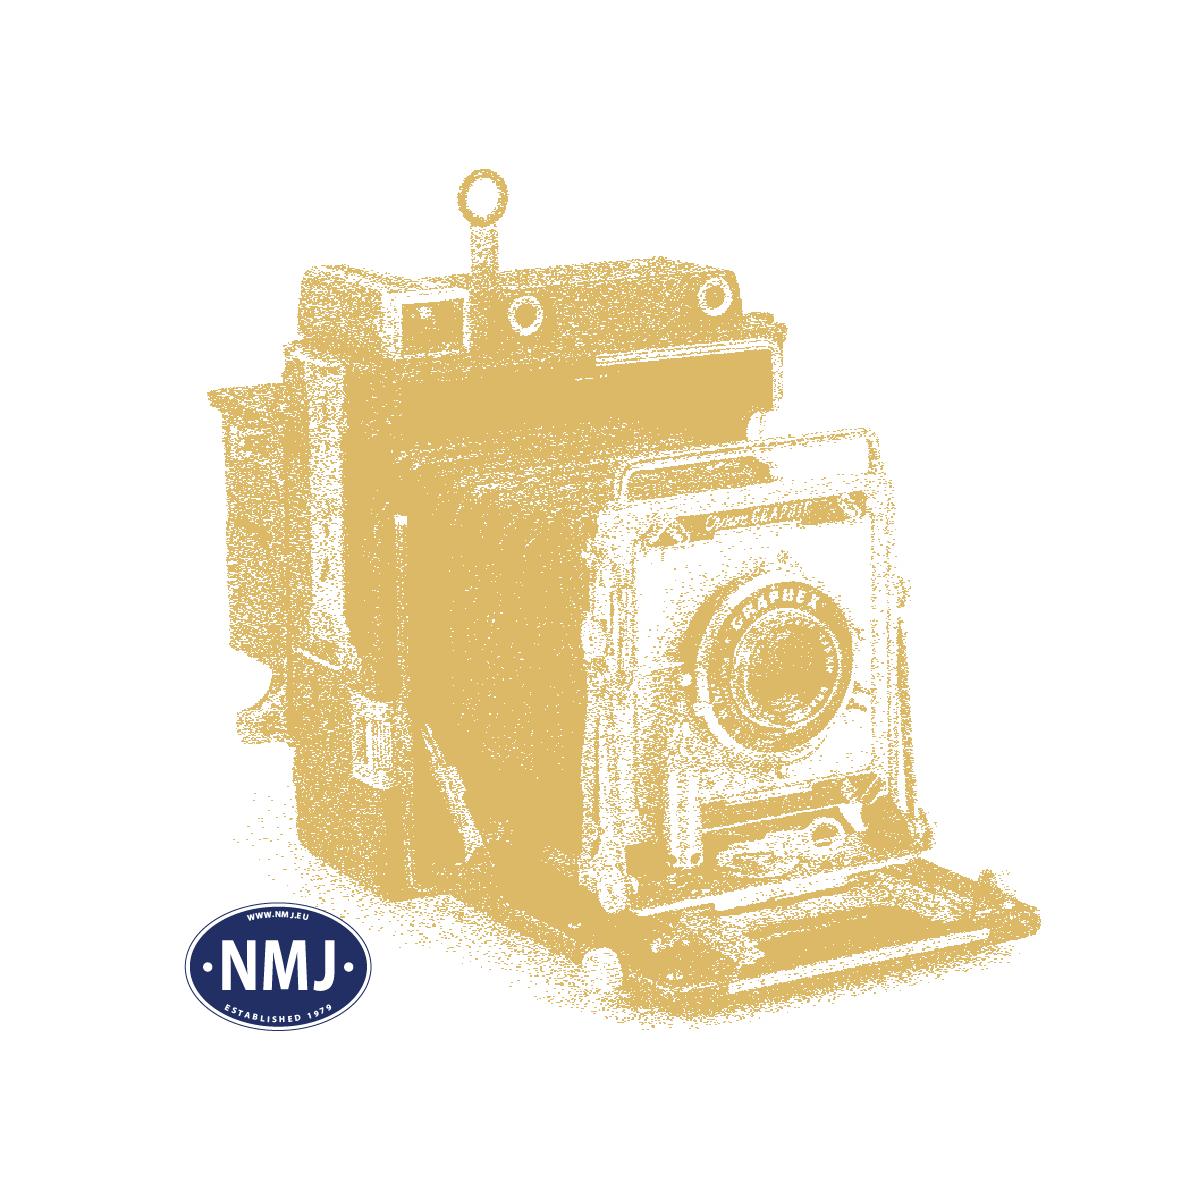 NMJT84.203 - NMJ Topline NSB BM69A.06, DCC m/ Lyd